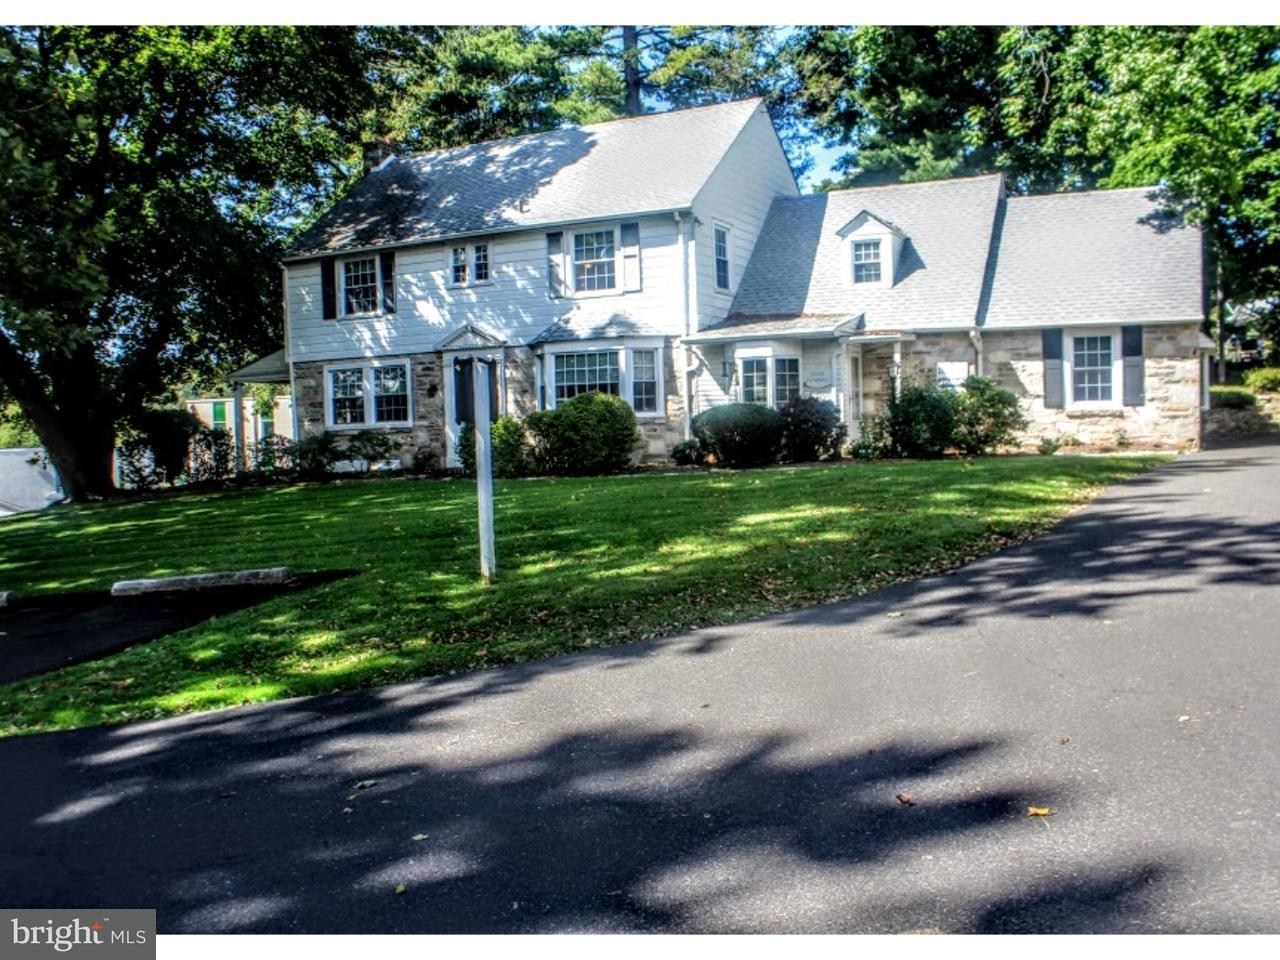 Single Family Home for Rent at 2 HIDDEN Lane Abington, Pennsylvania 19001 United States